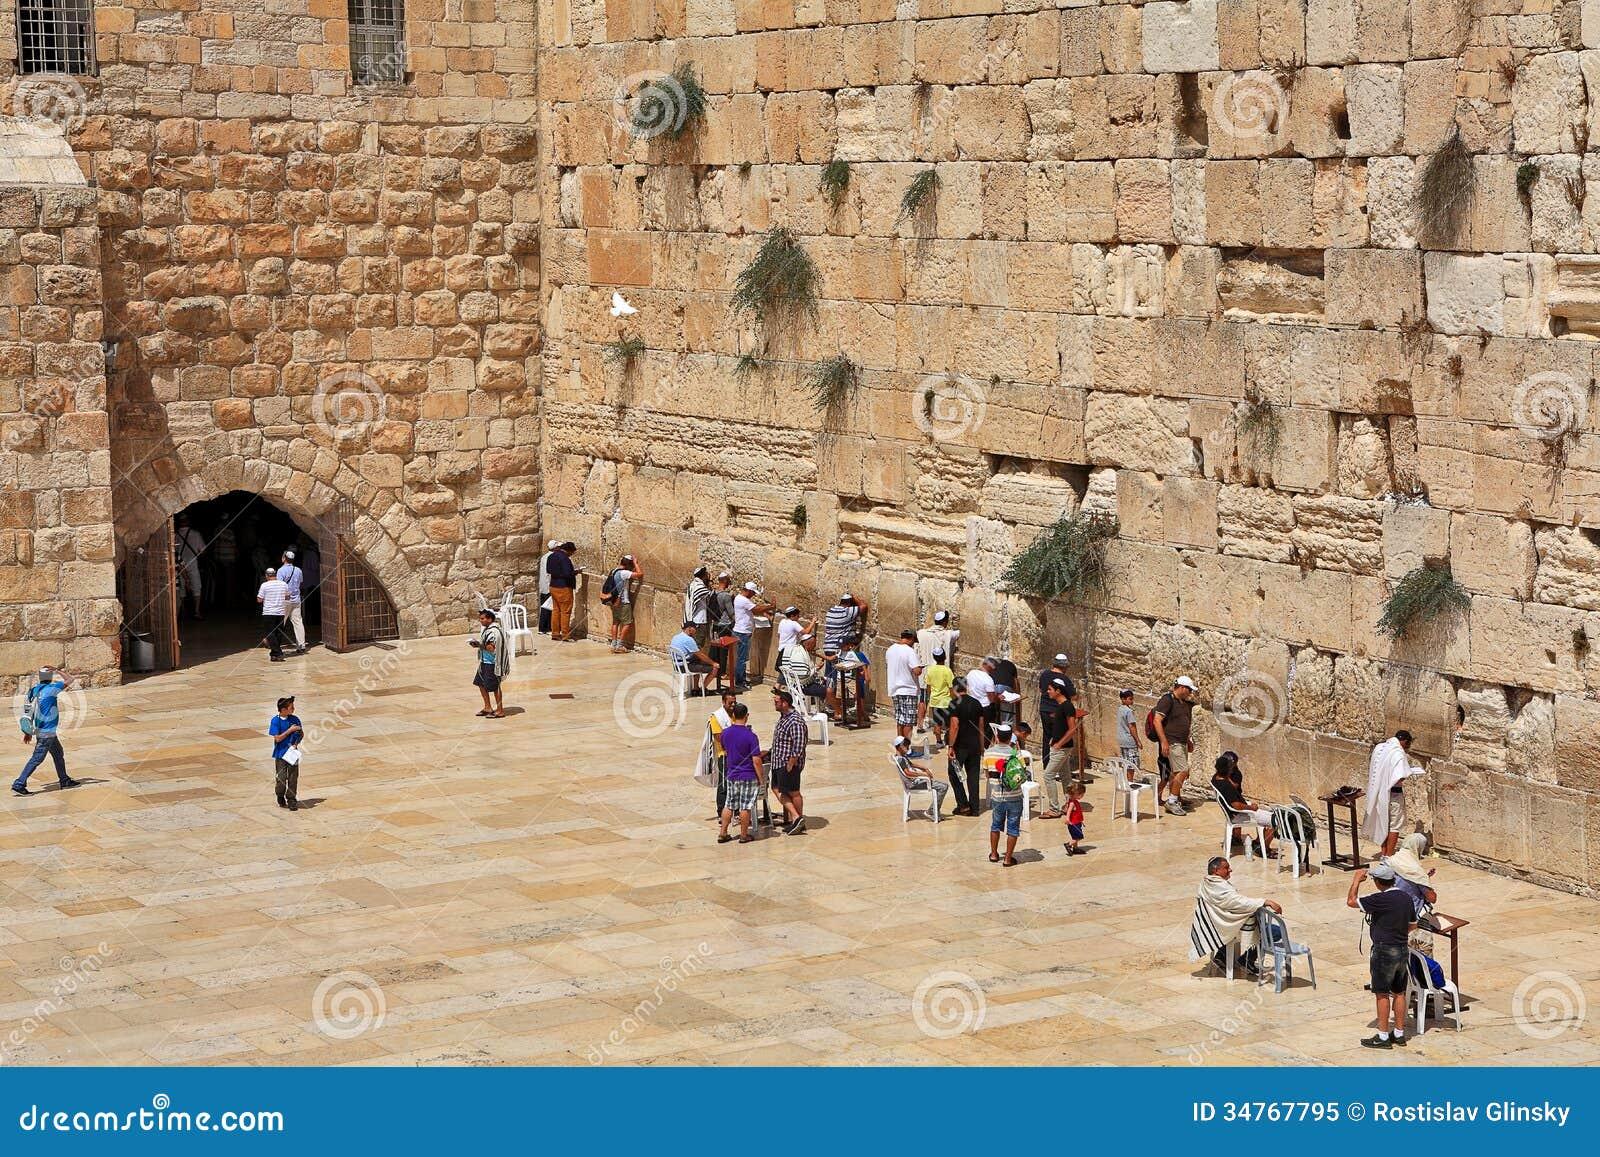 Israel online dating sites